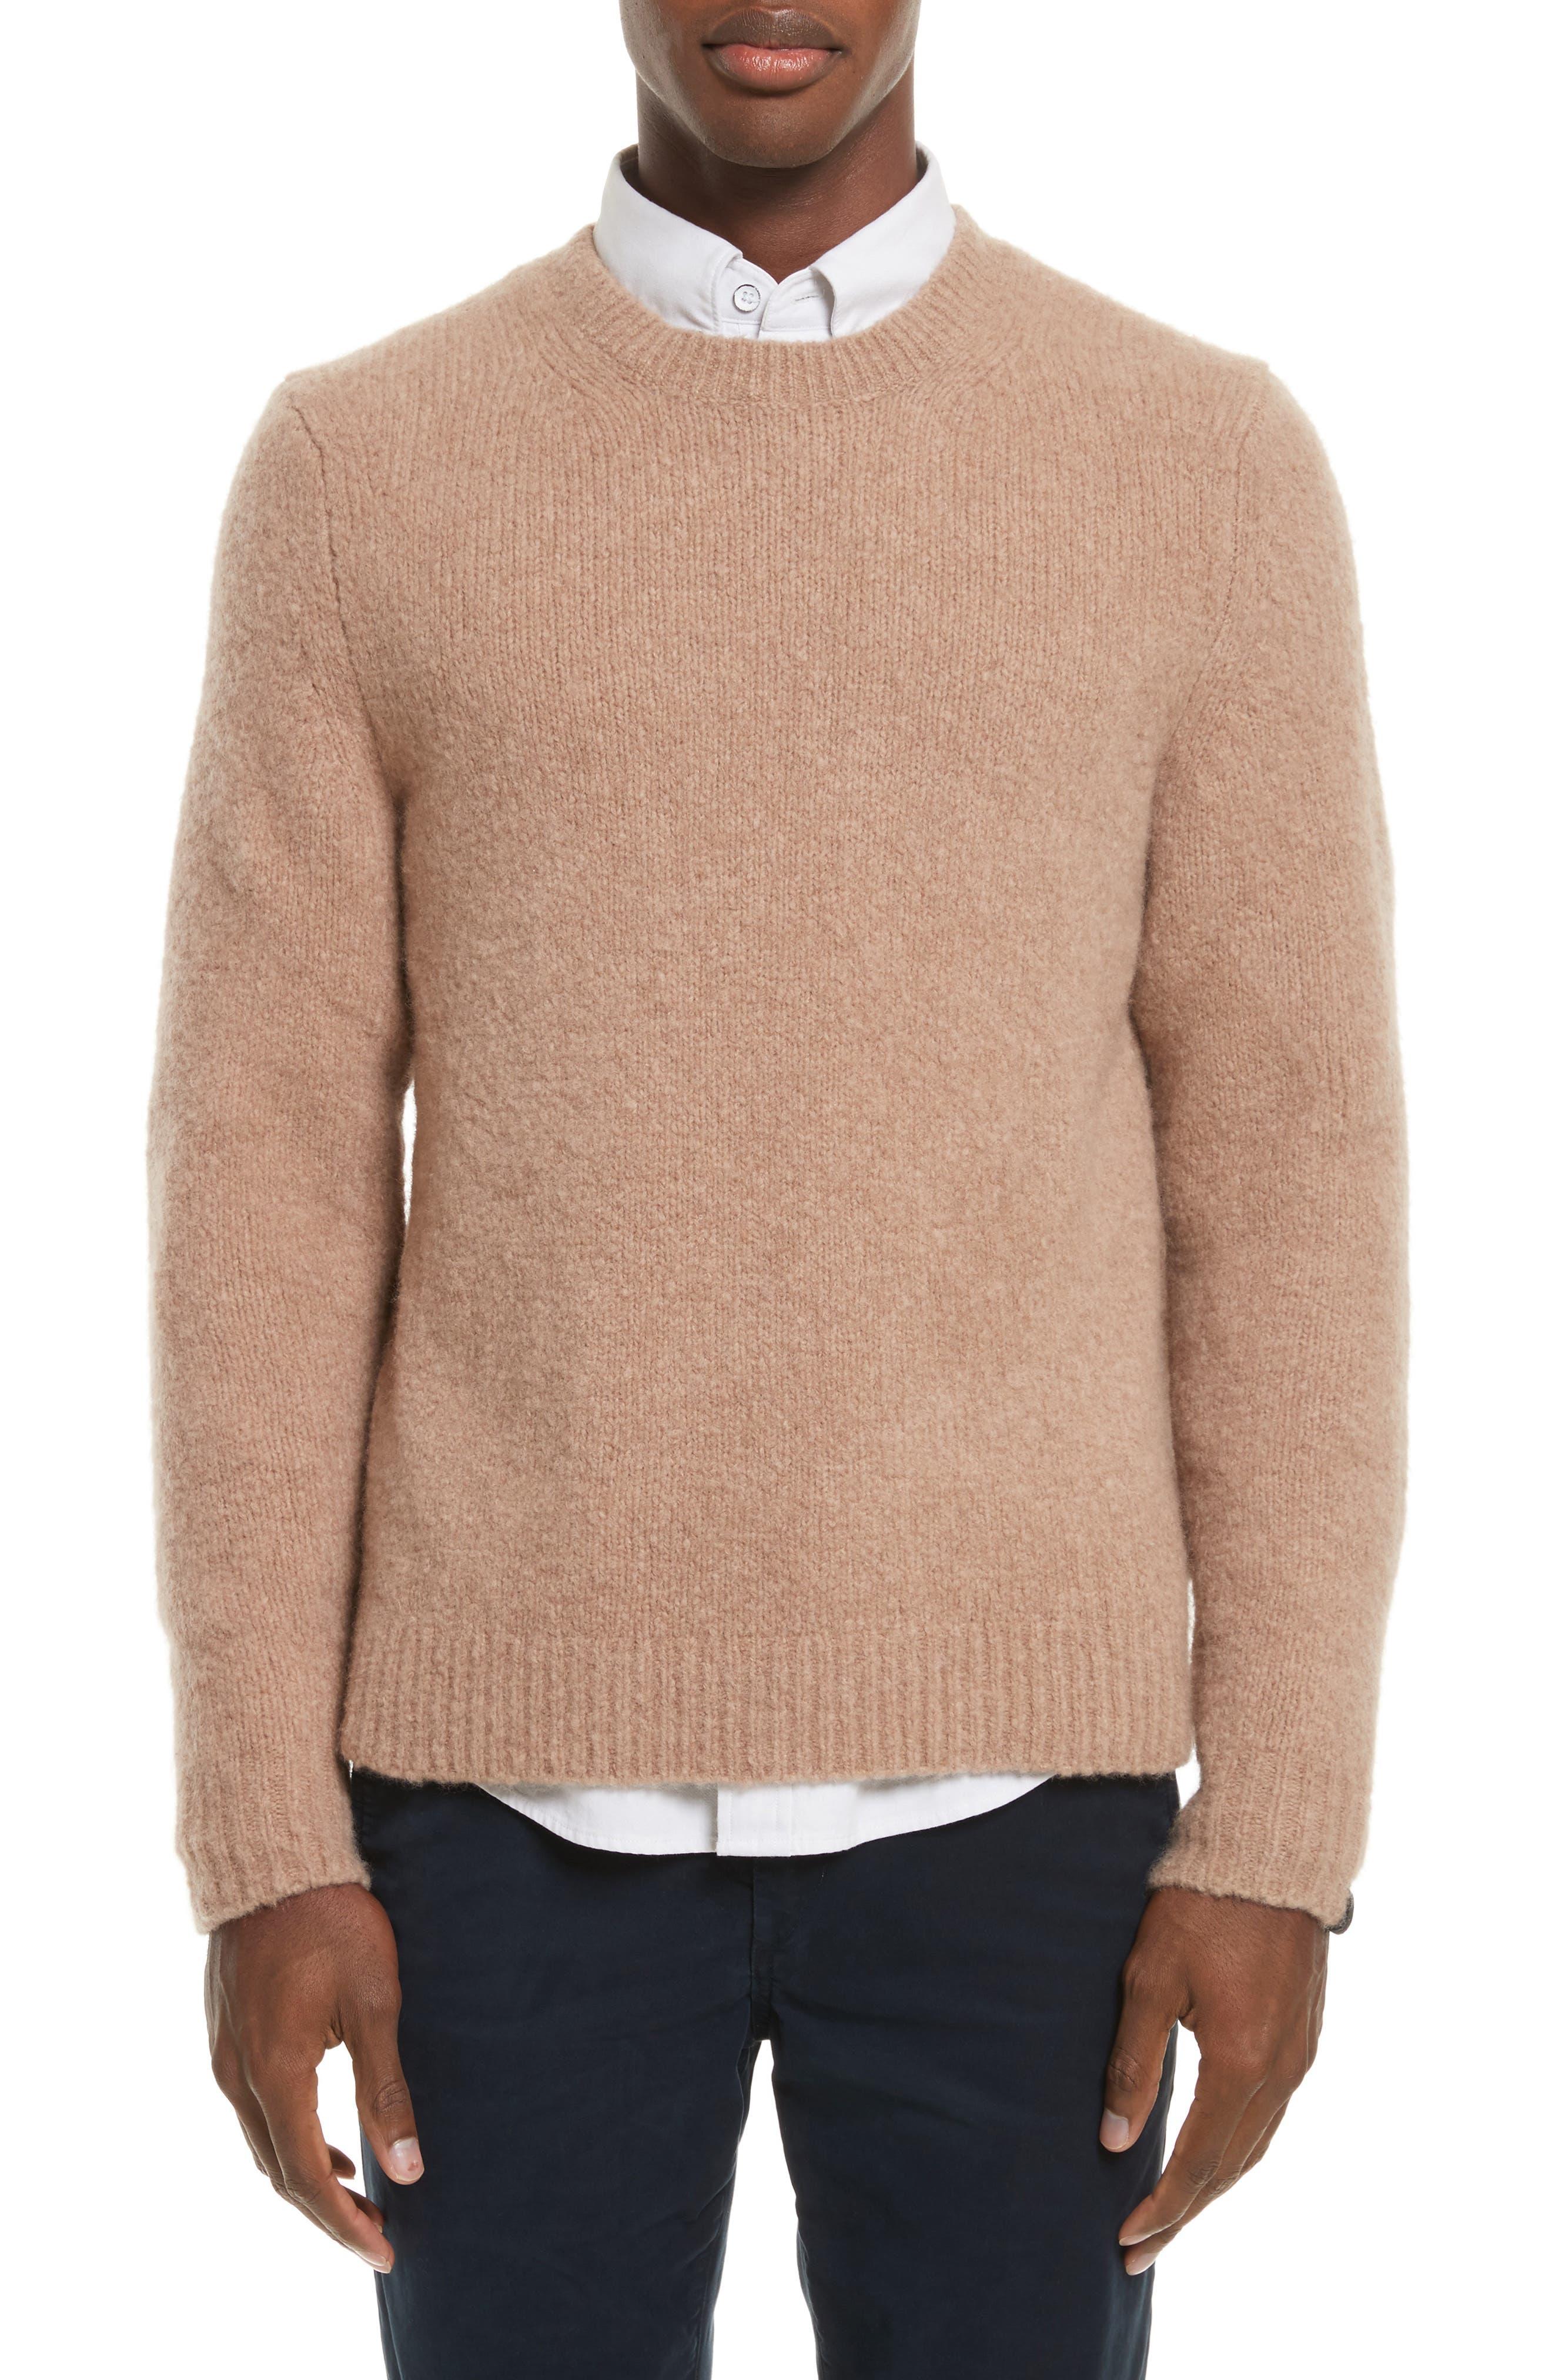 Alternate Image 1 Selected - rag & bone Charles Merino Wool Blend Sweater